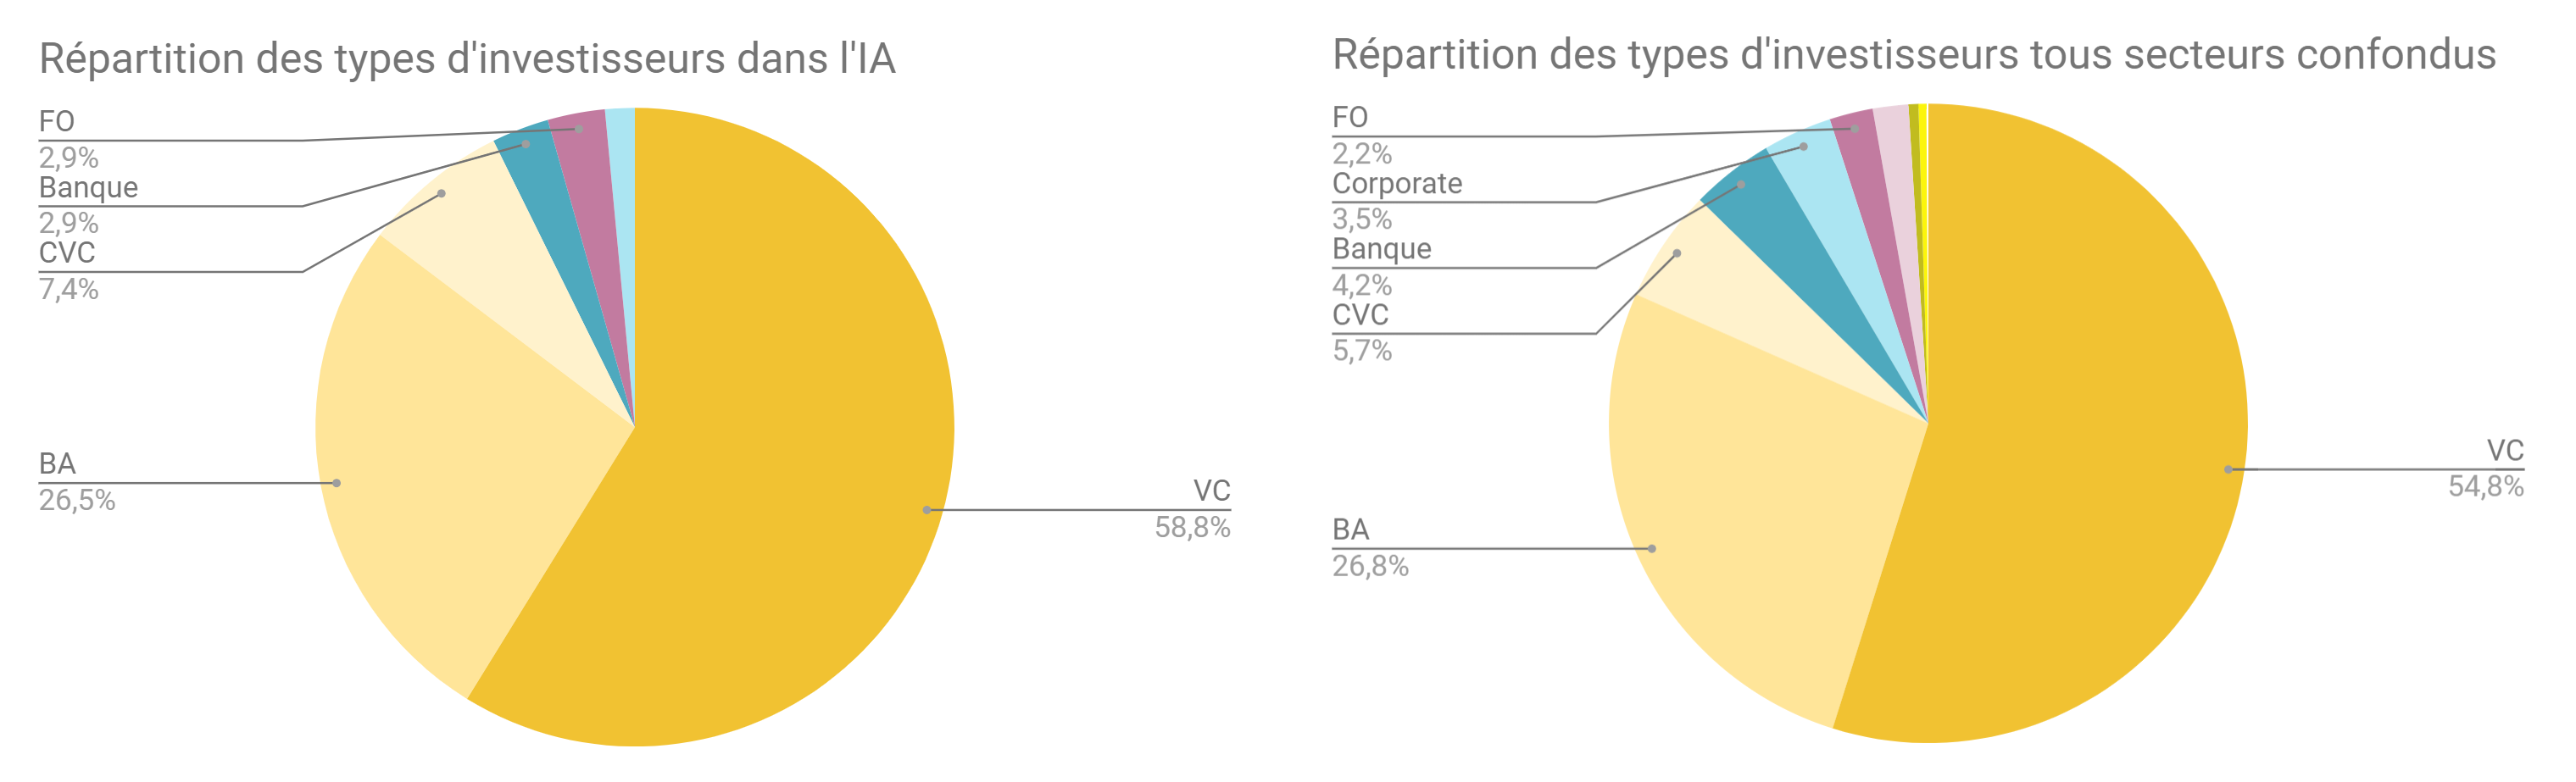 repartition_des_types_dinvestisseurs_0.png